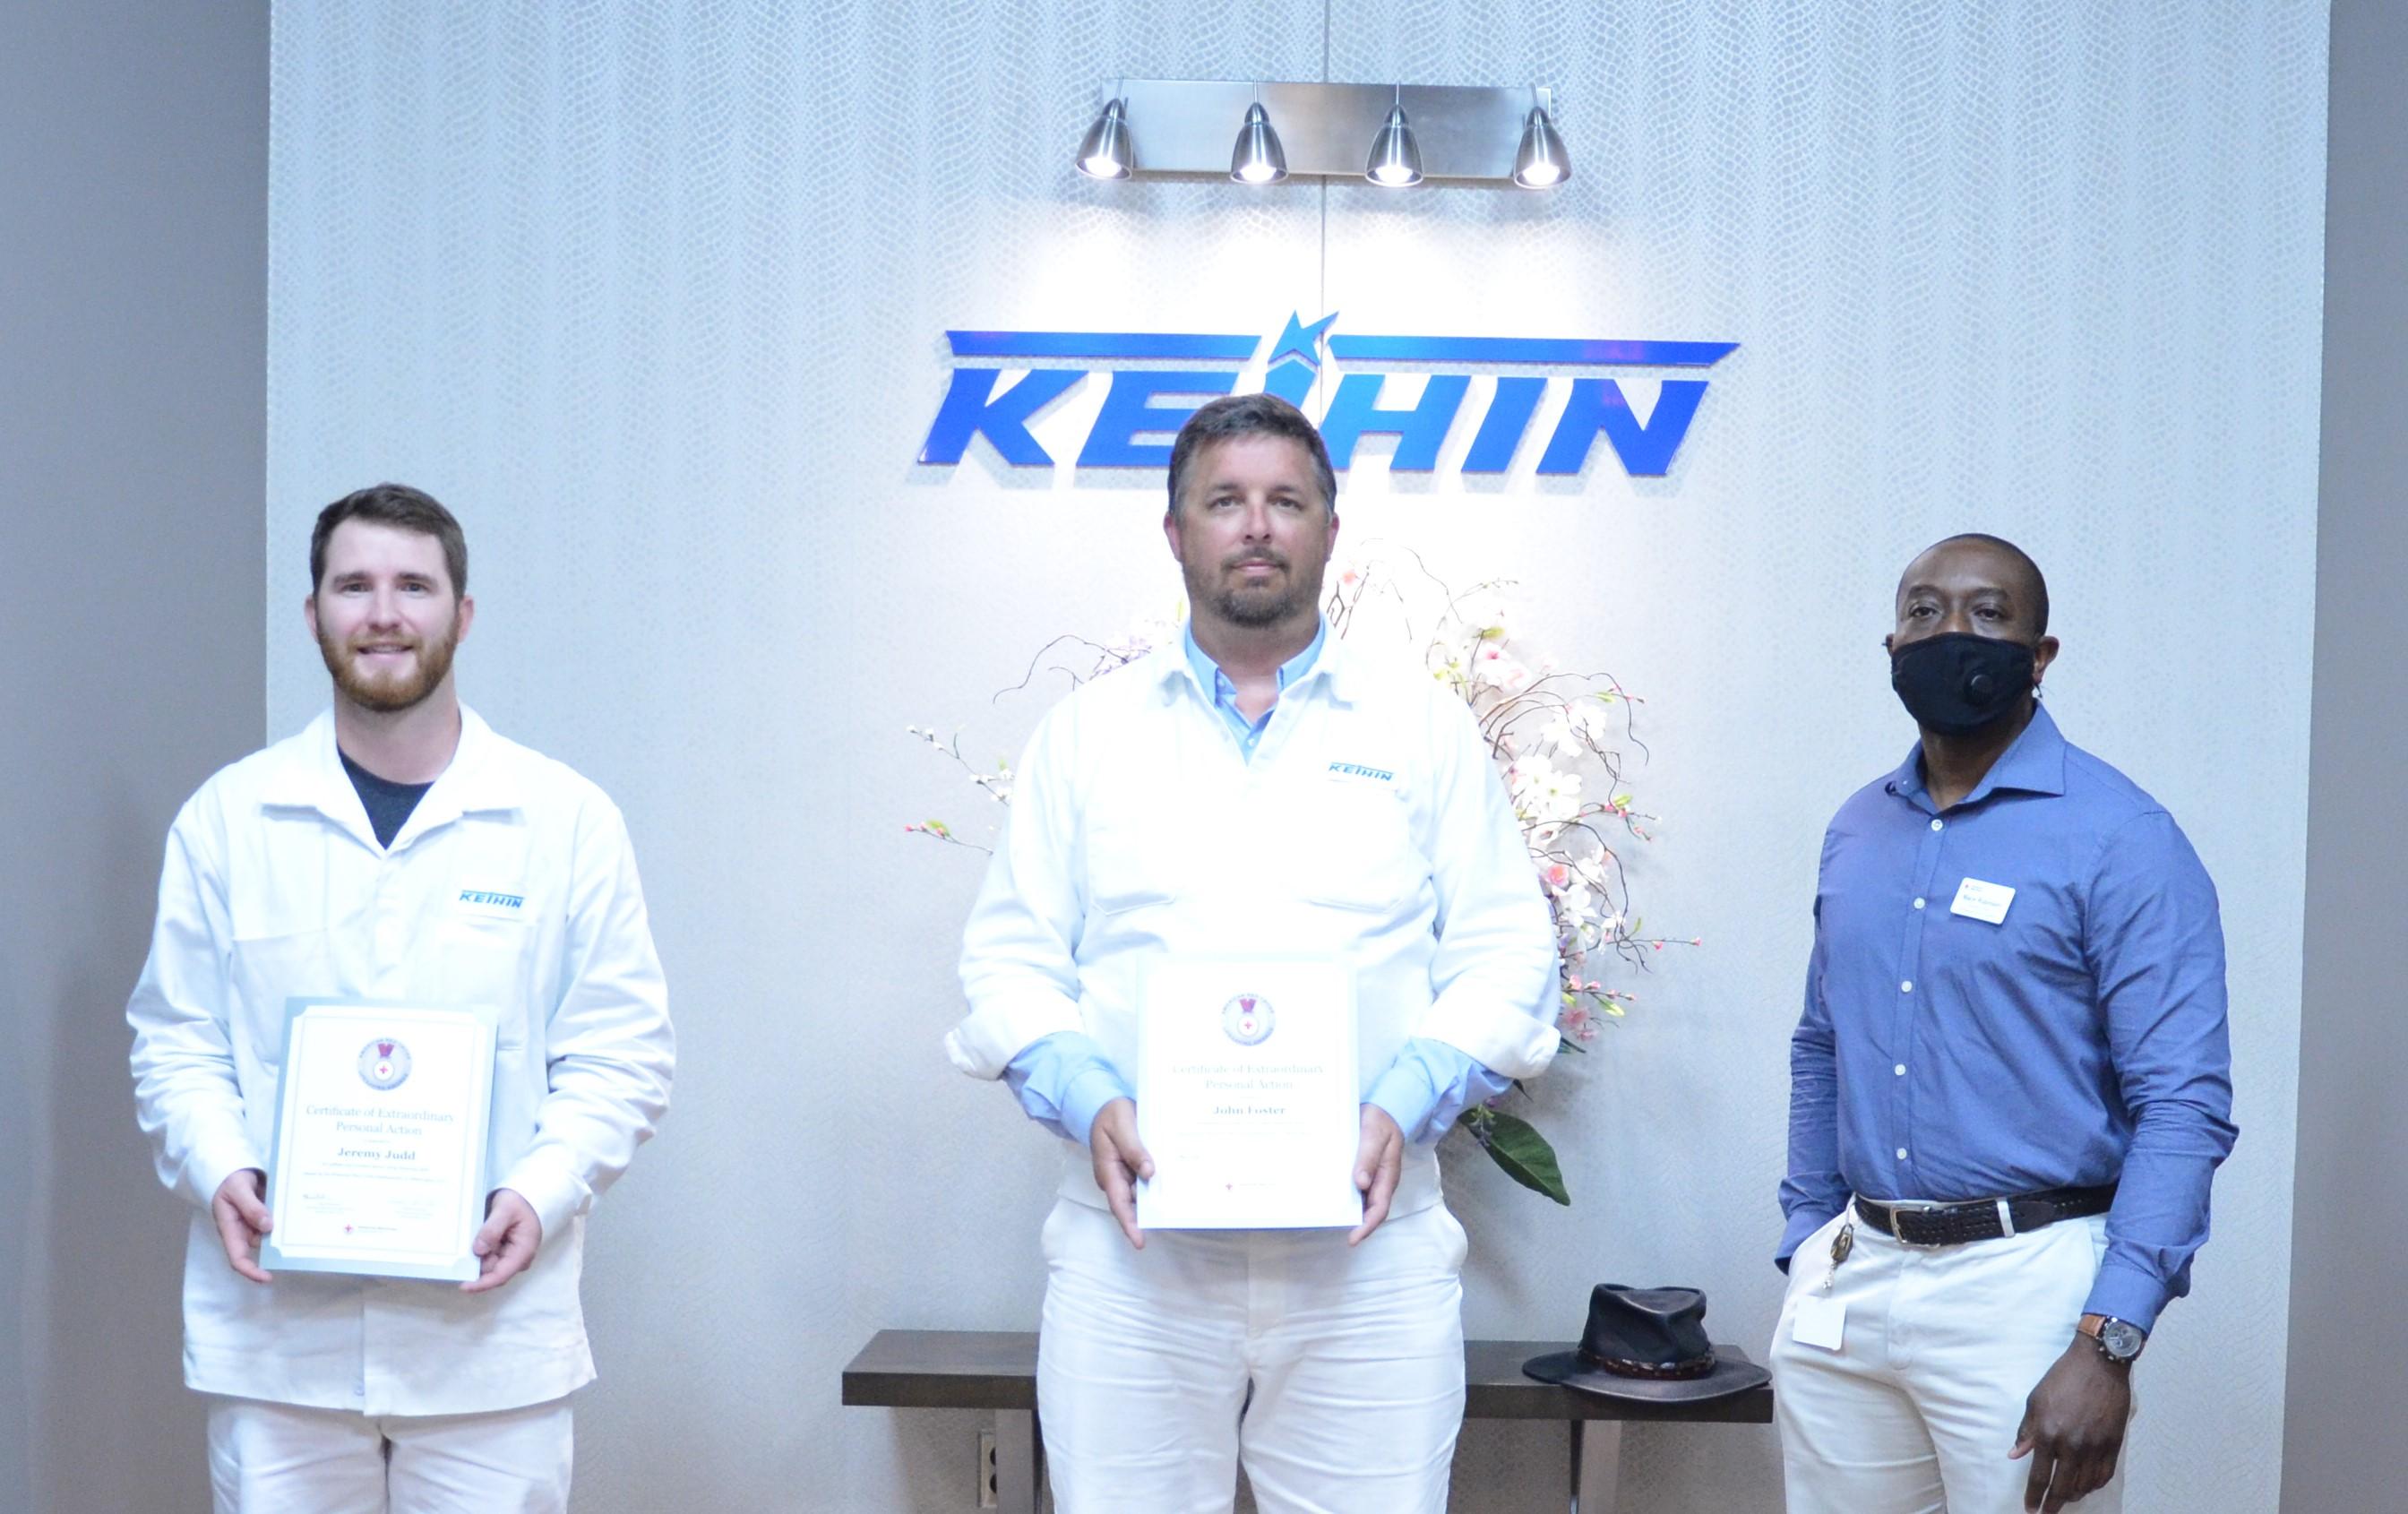 Keihin Lifesaving Awards - Jeremy Judd - John Foster - Mace Robinson 6-15-2020